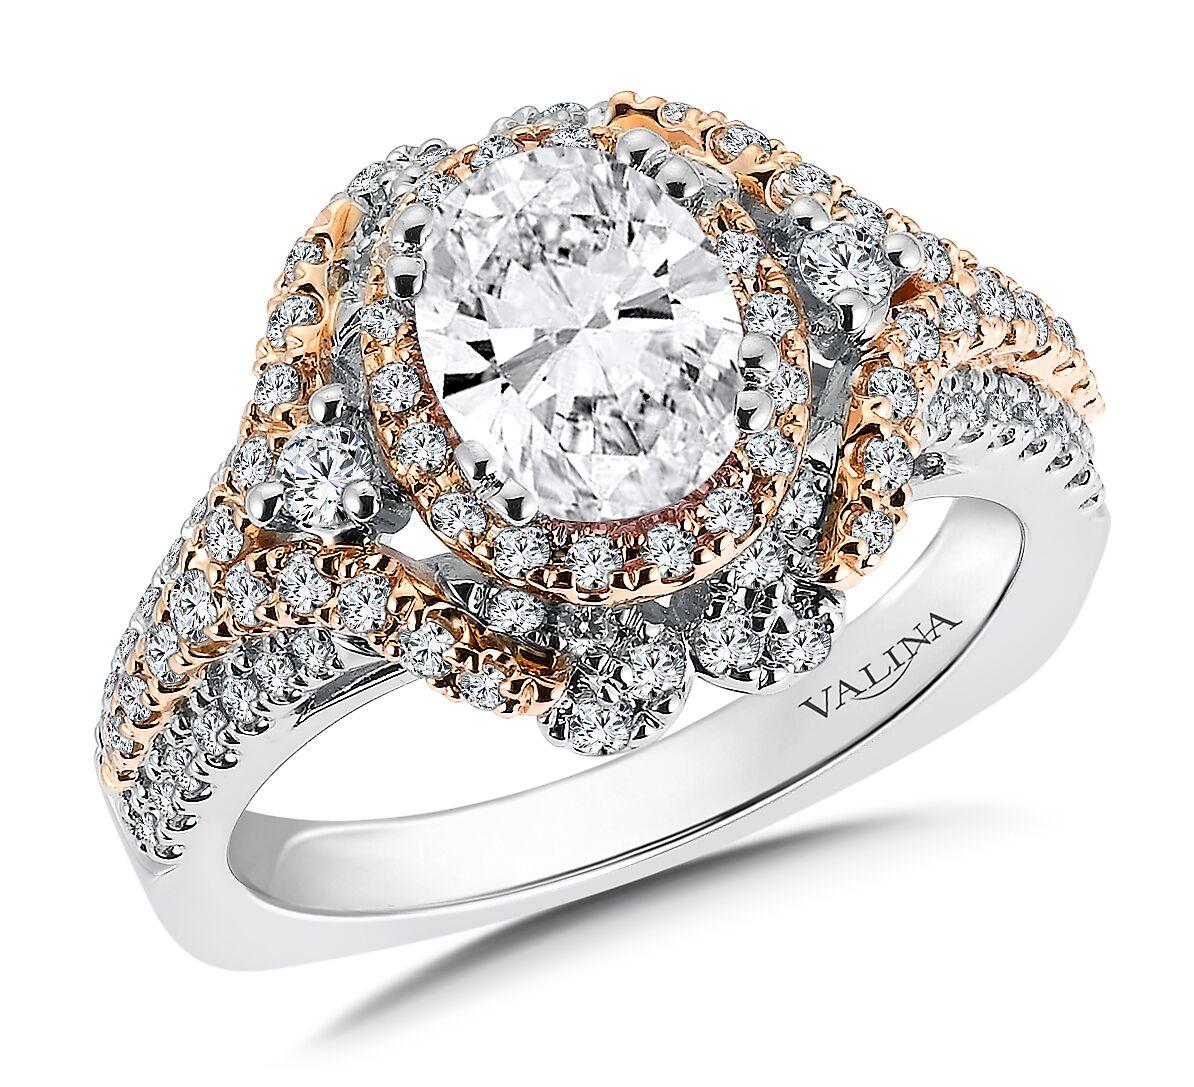 Highland Park Wholesale Loose Diamond, Shira Diamonds